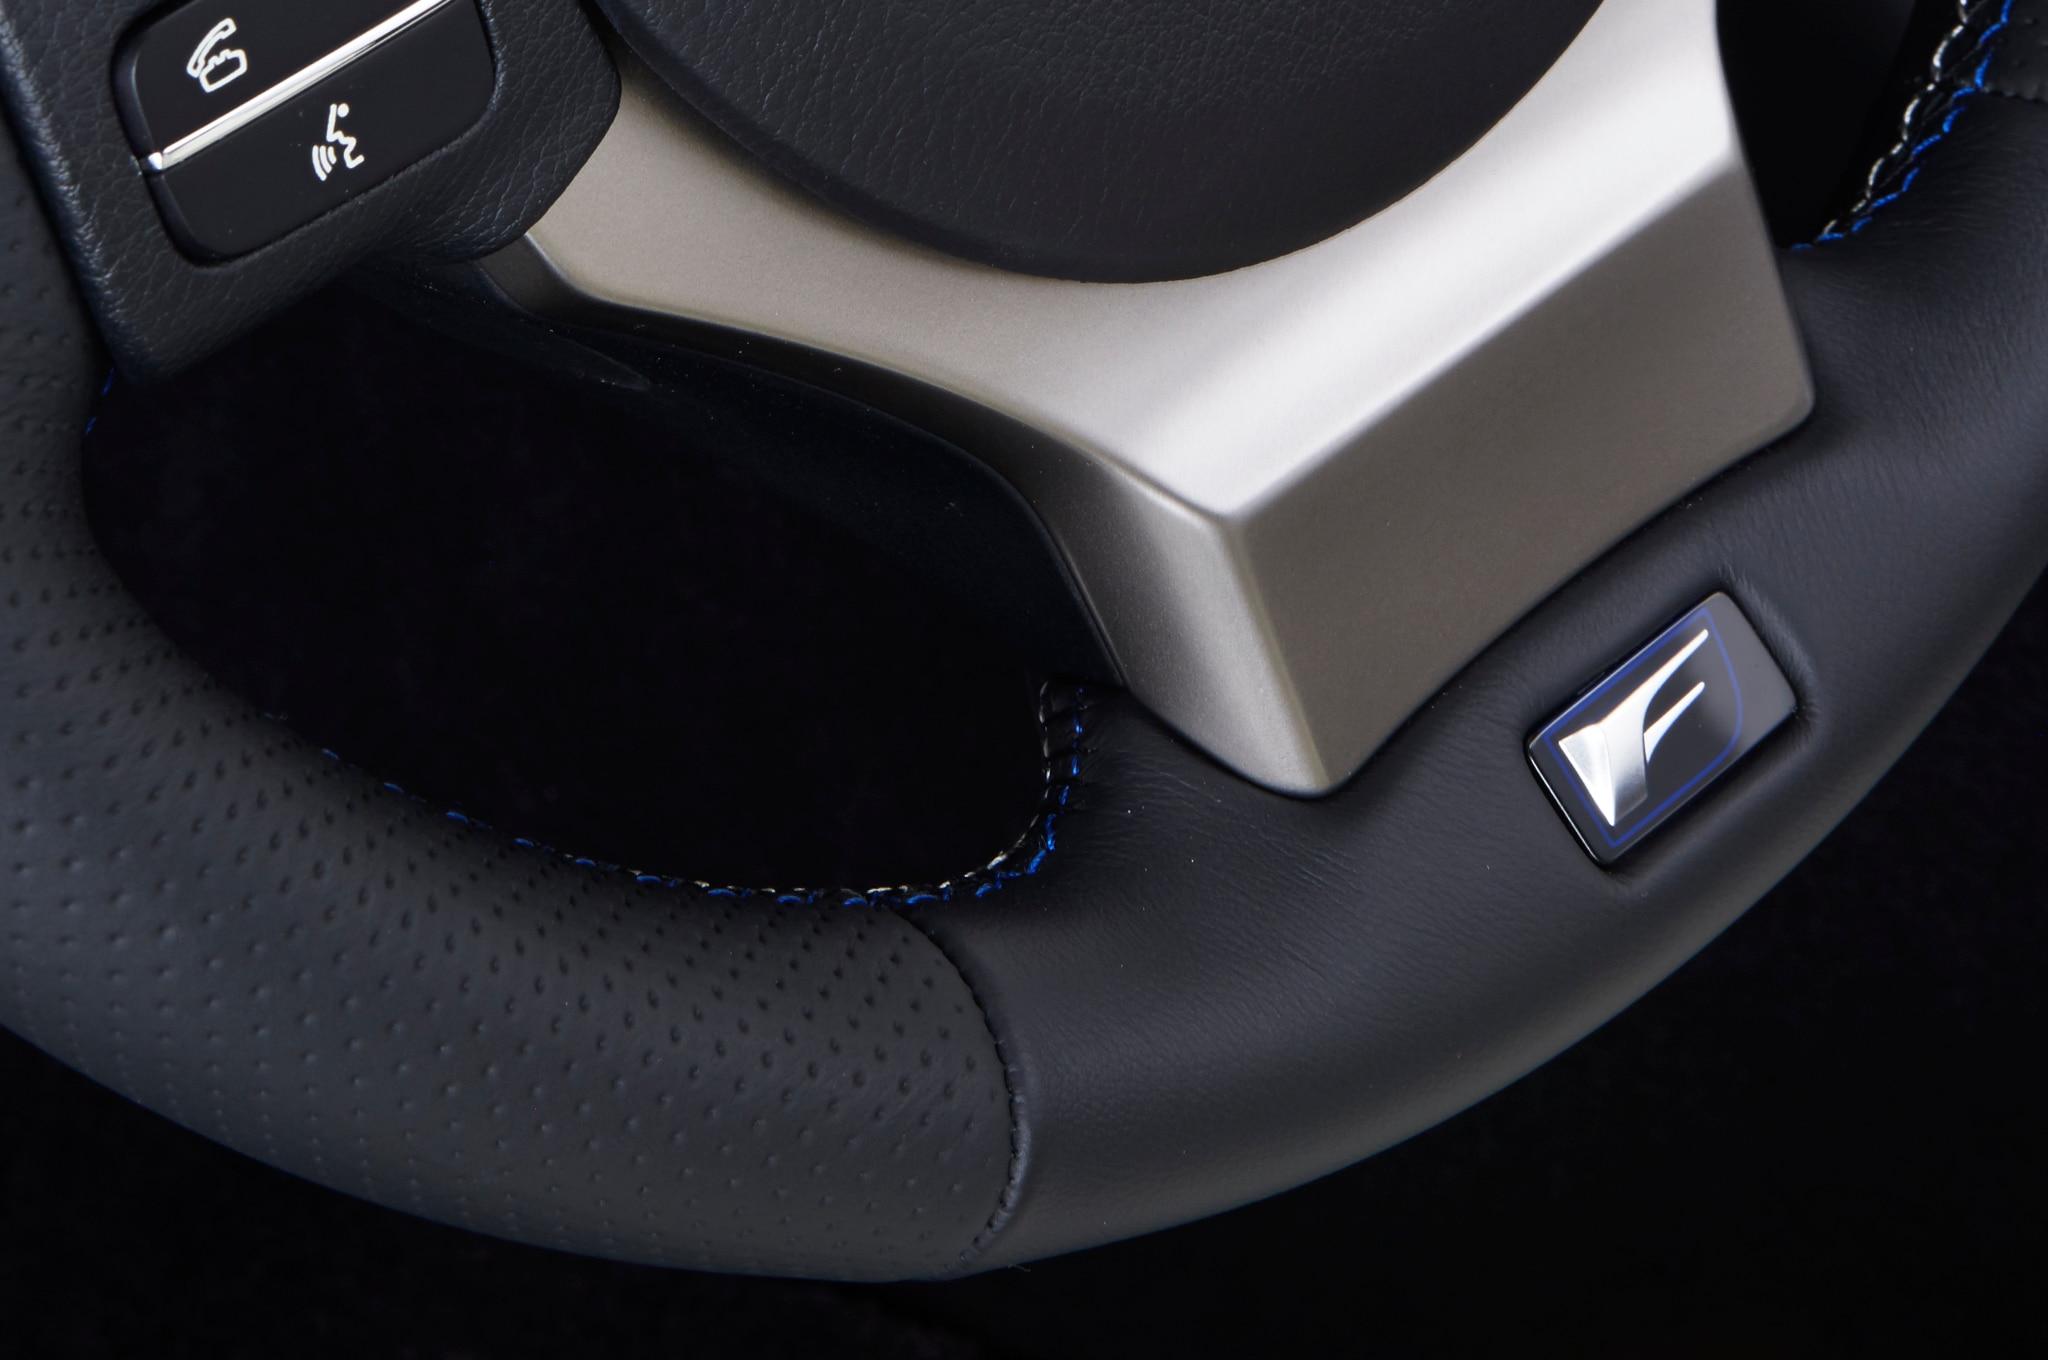 2015 lexus rc f debuts at 2014 detroit auto show. Black Bedroom Furniture Sets. Home Design Ideas